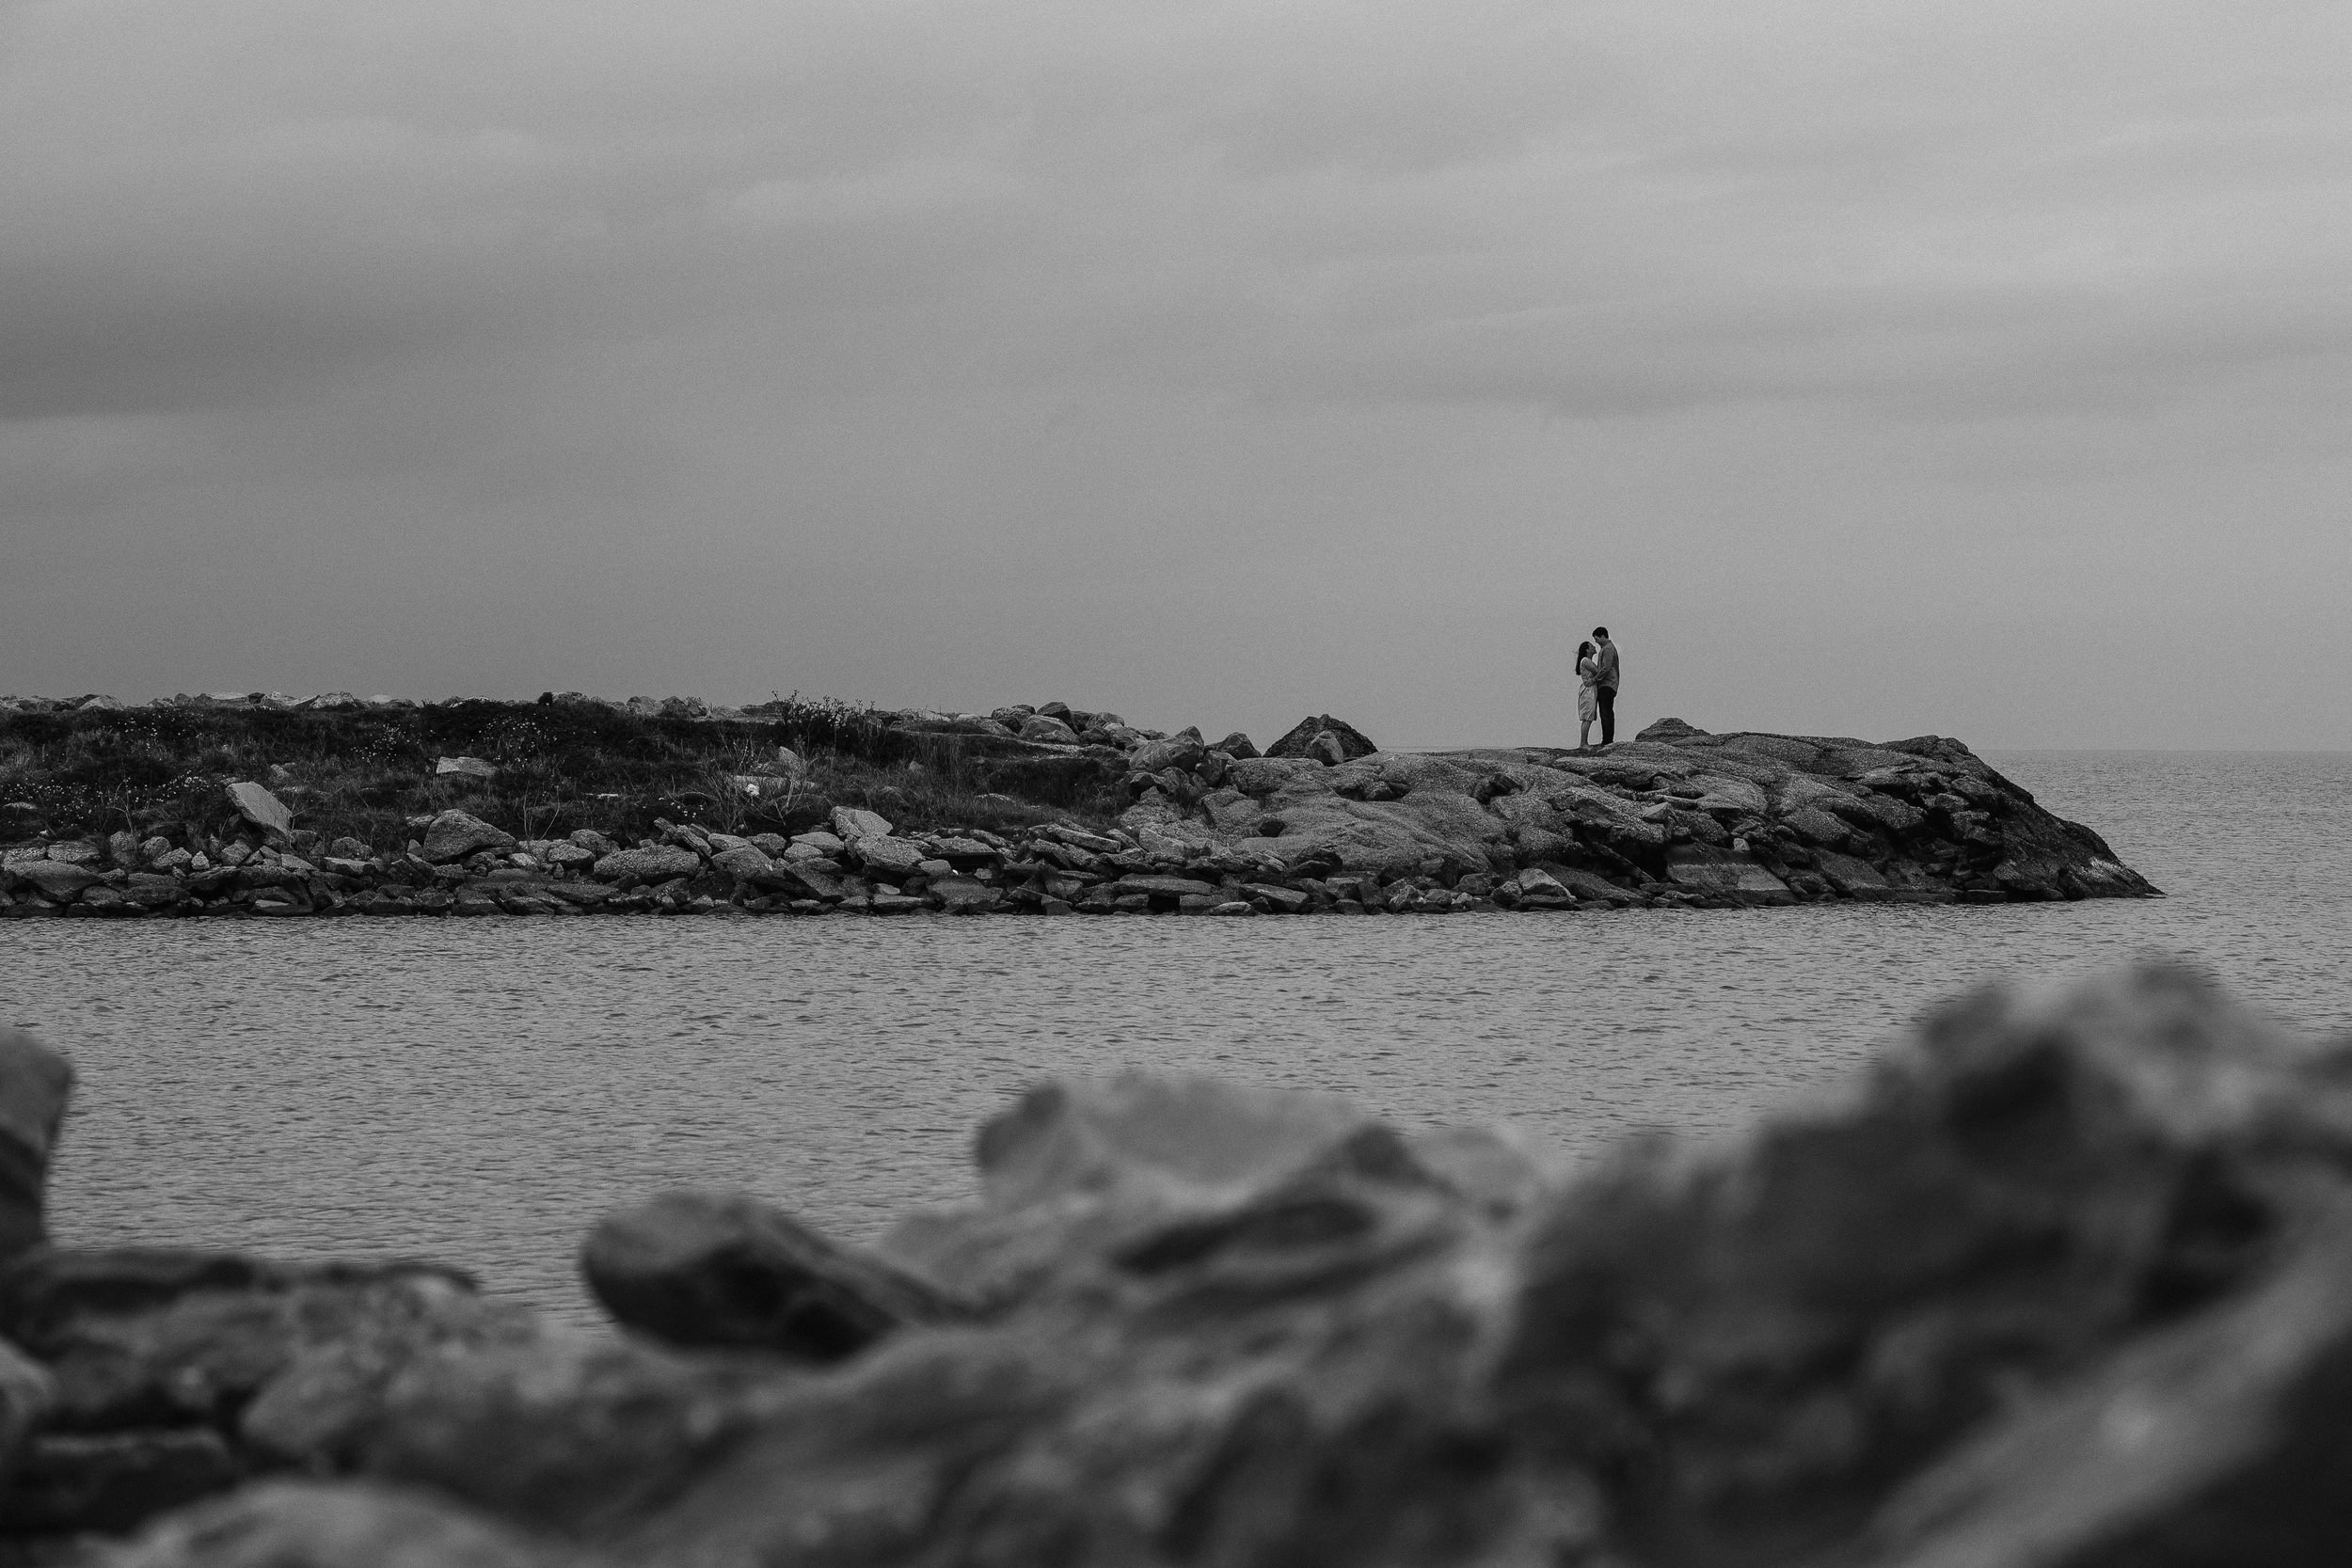 couple on the lake